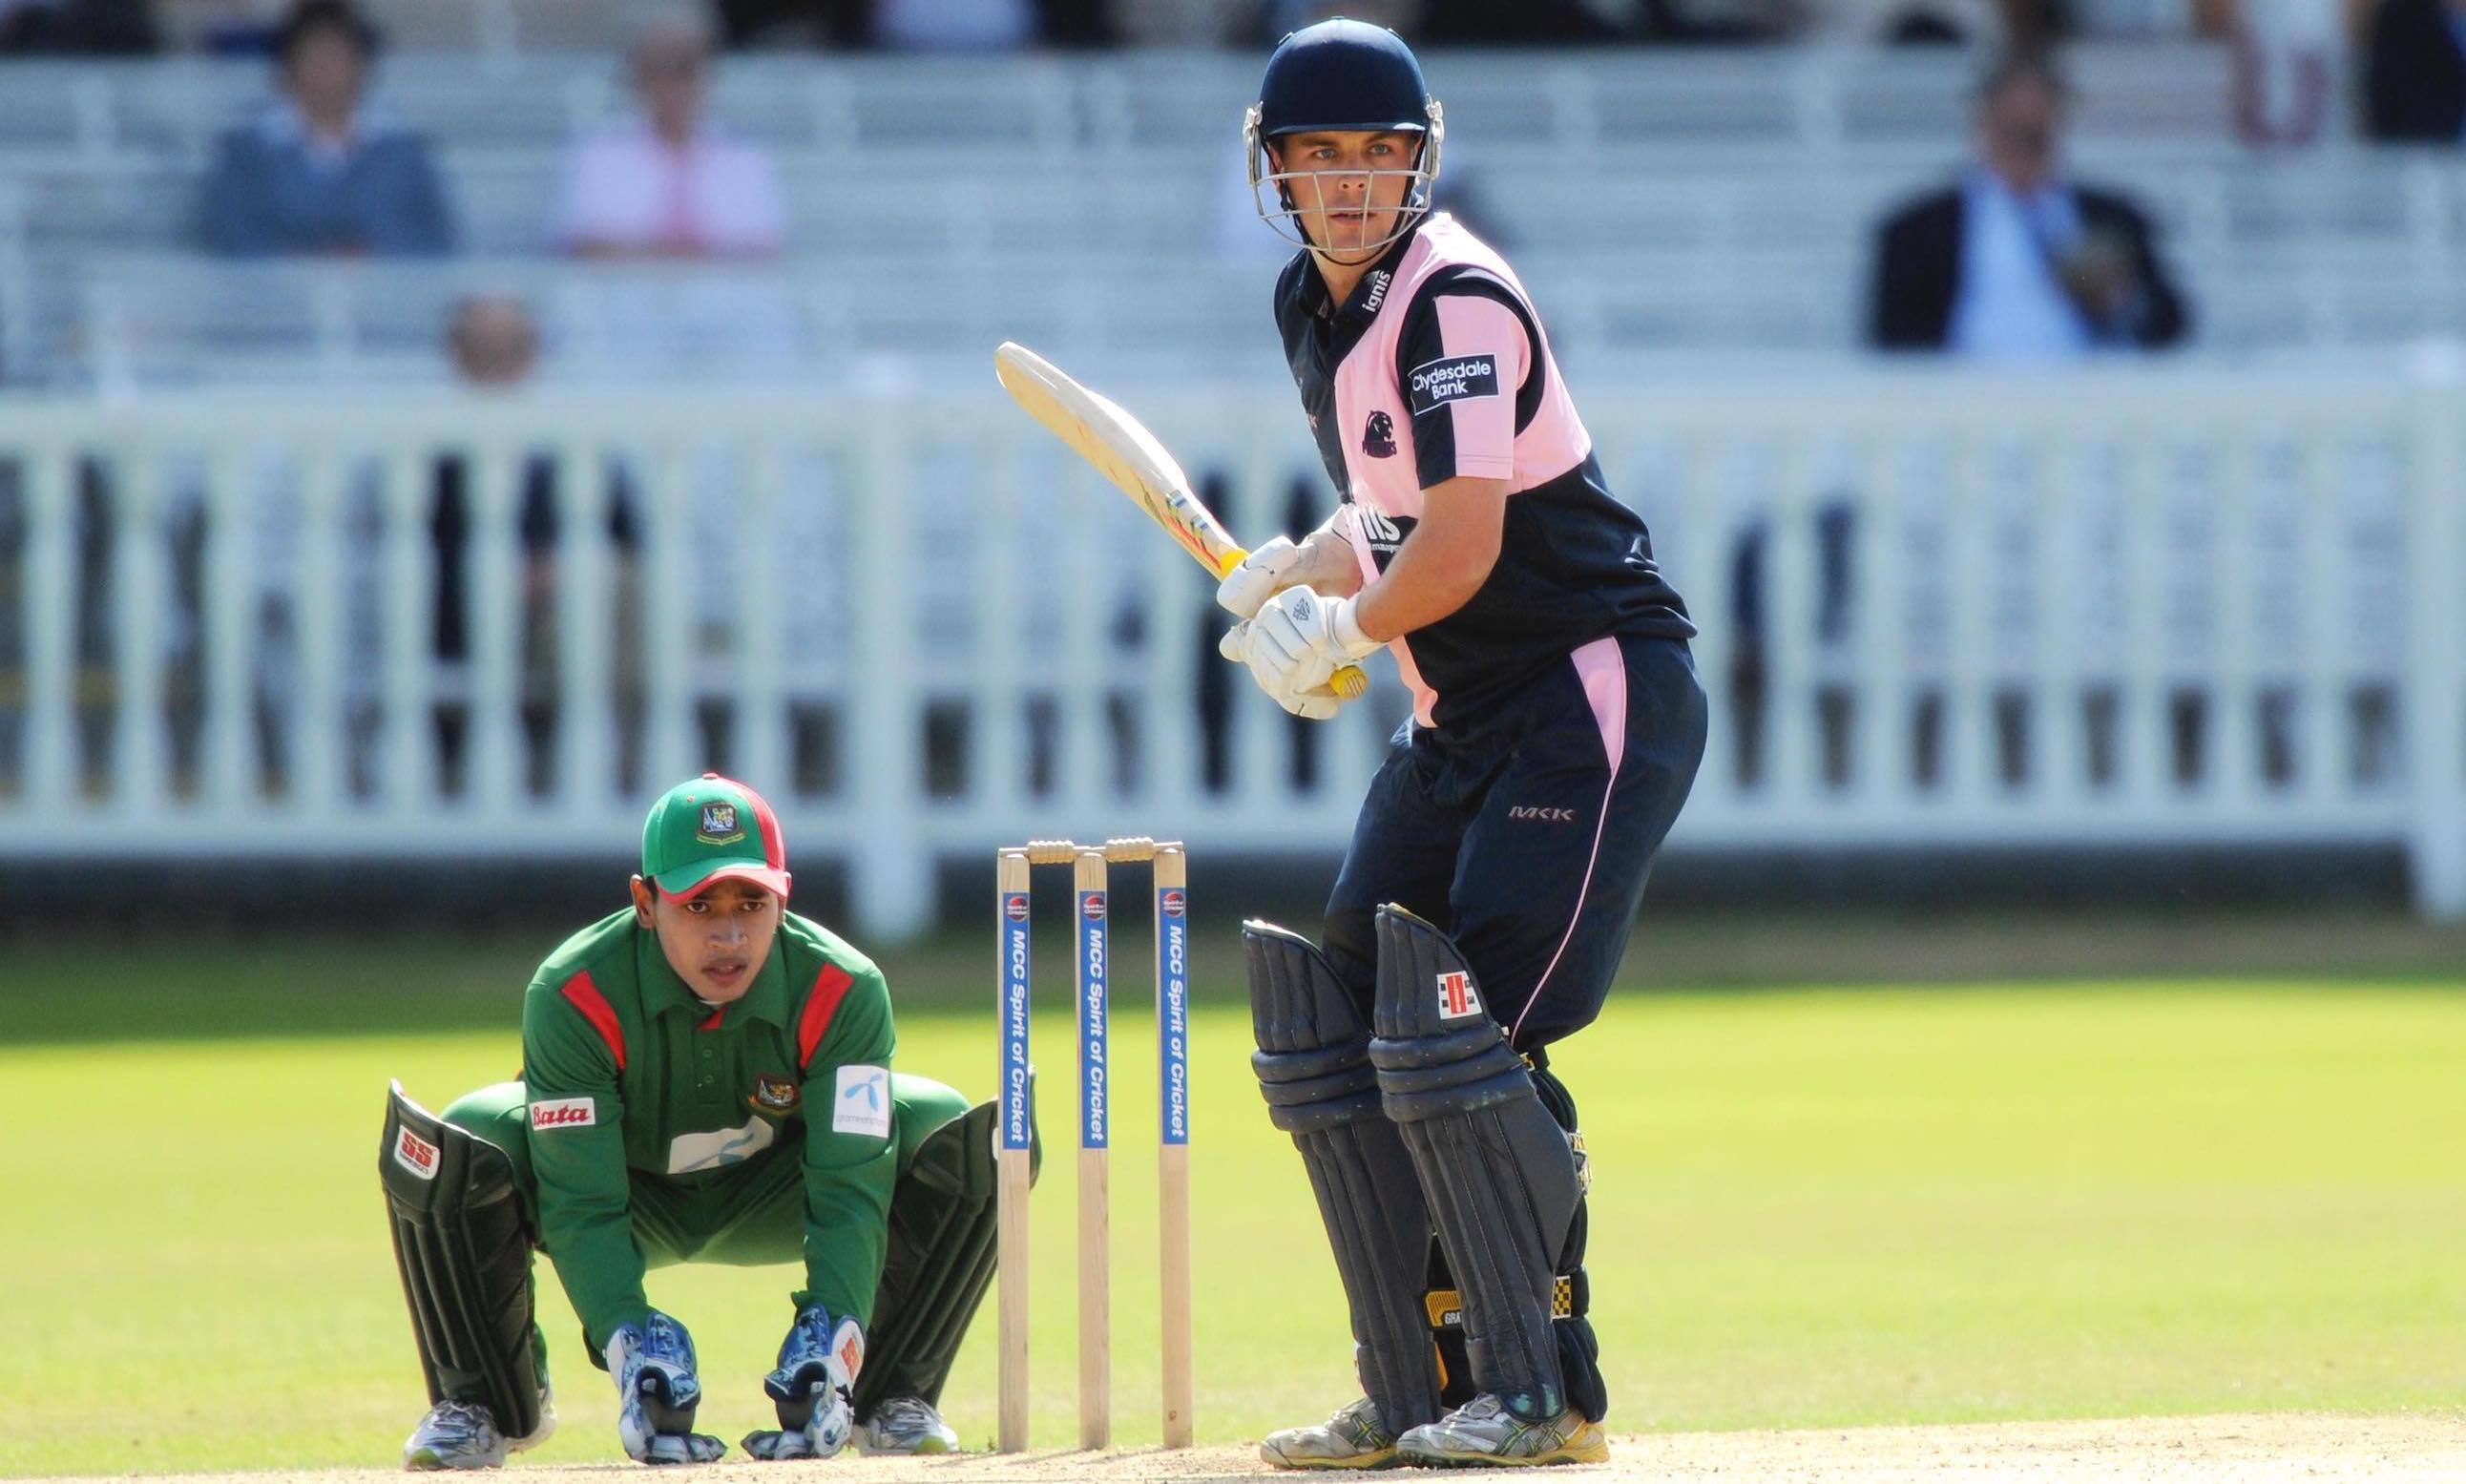 Mornington Peninsula Cricket Association